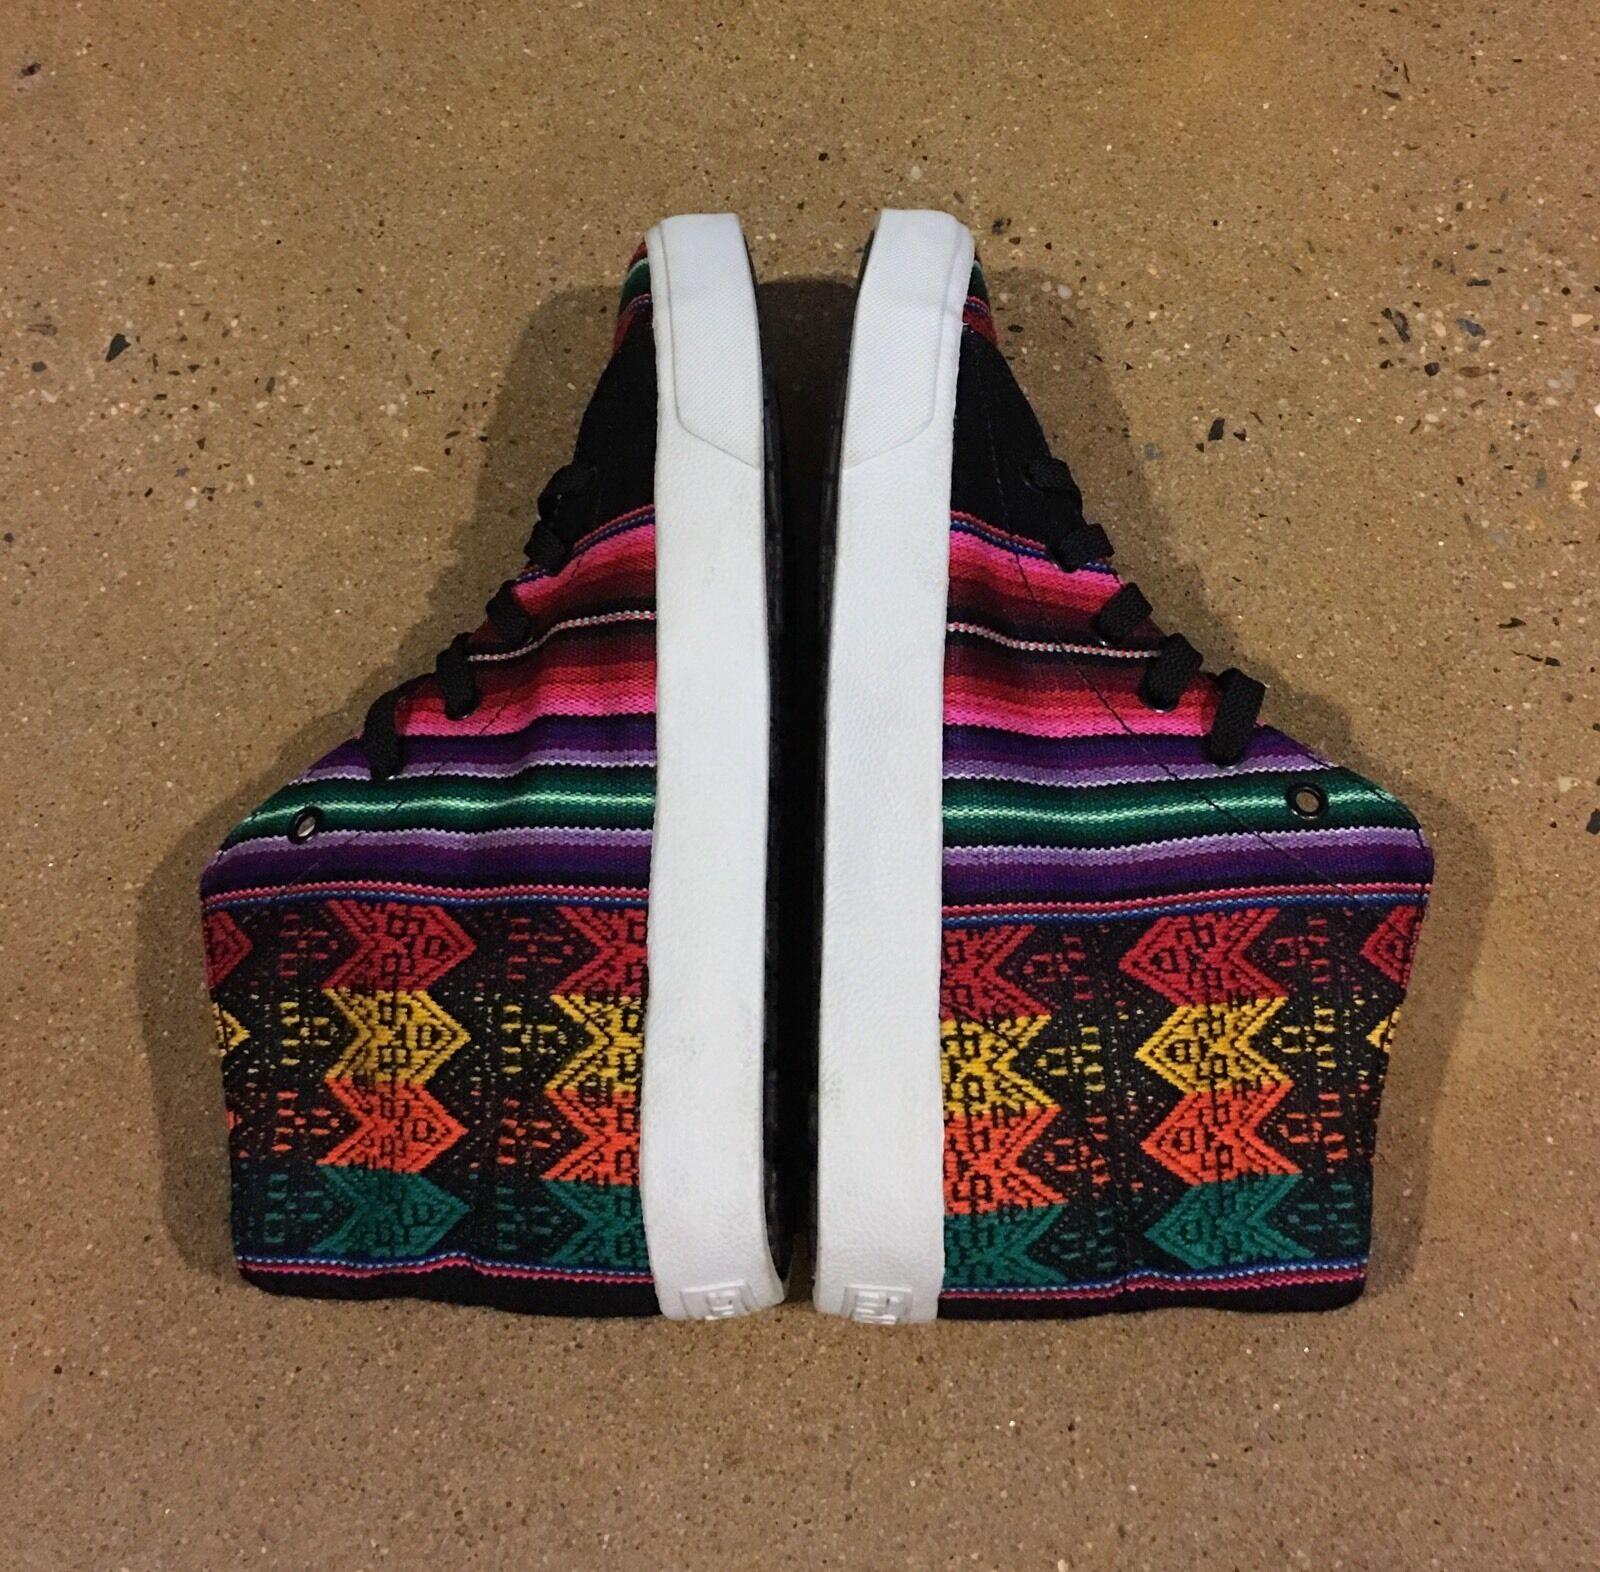 Inkkas JR'S Spectrum Hightop Größe 8 Damens 6-Boys Schuhes Sneakers Handmade In Peru